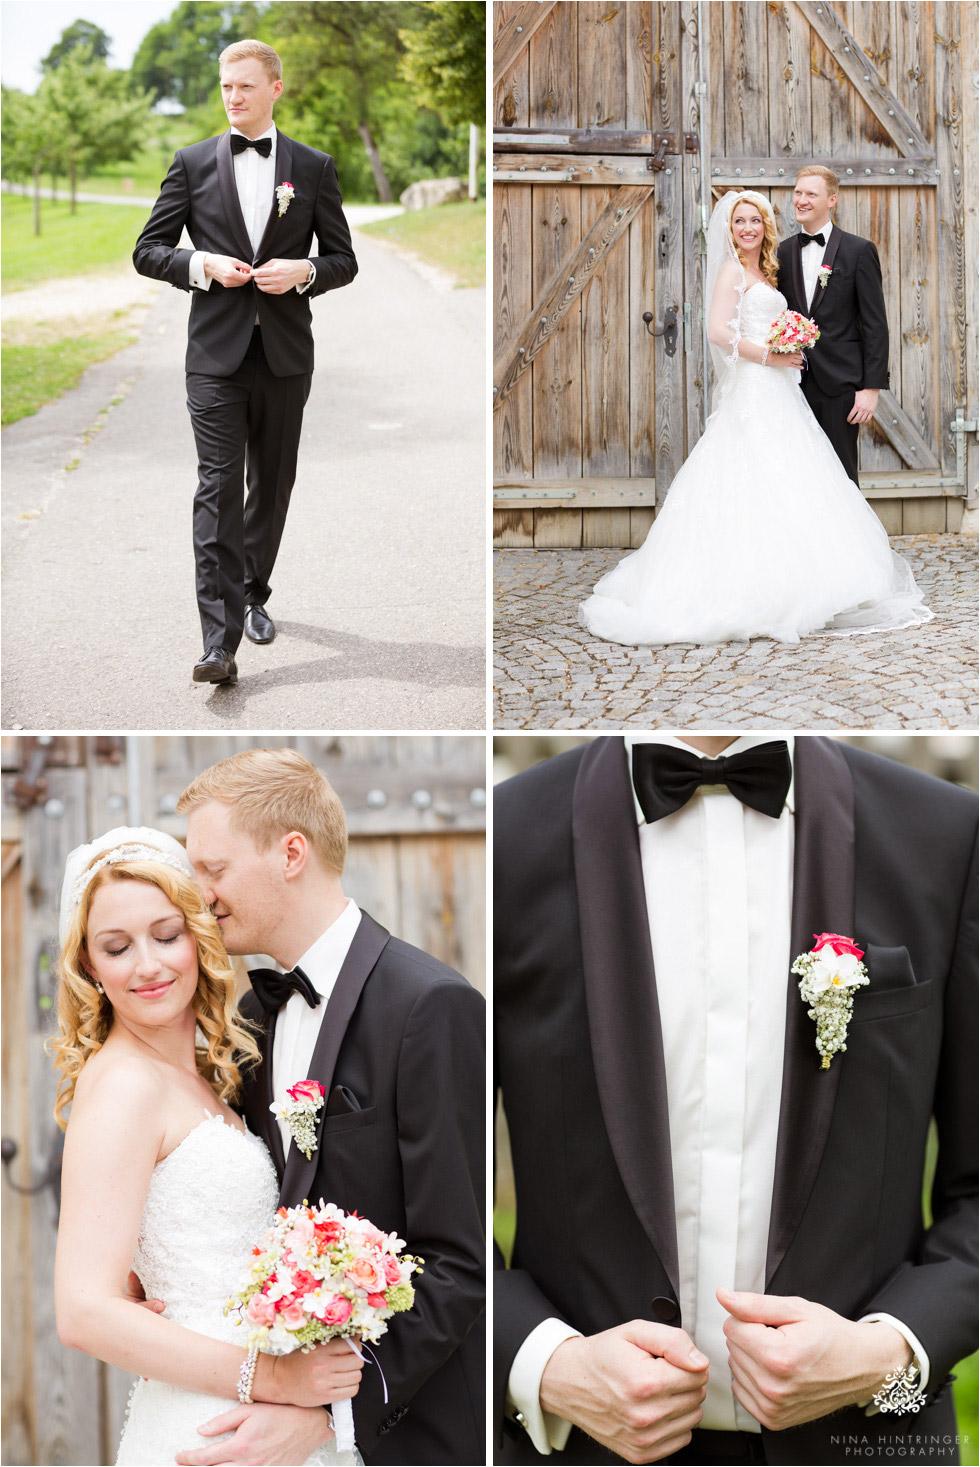 Hofgut Maisenburg Wedding with Gold & Coralline Eye Candy   Melanie & Philipp   Hayingen, Germany - Blog of Nina Hintringer Photography - Wedding Photography, Wedding Reportage and Destination Weddings